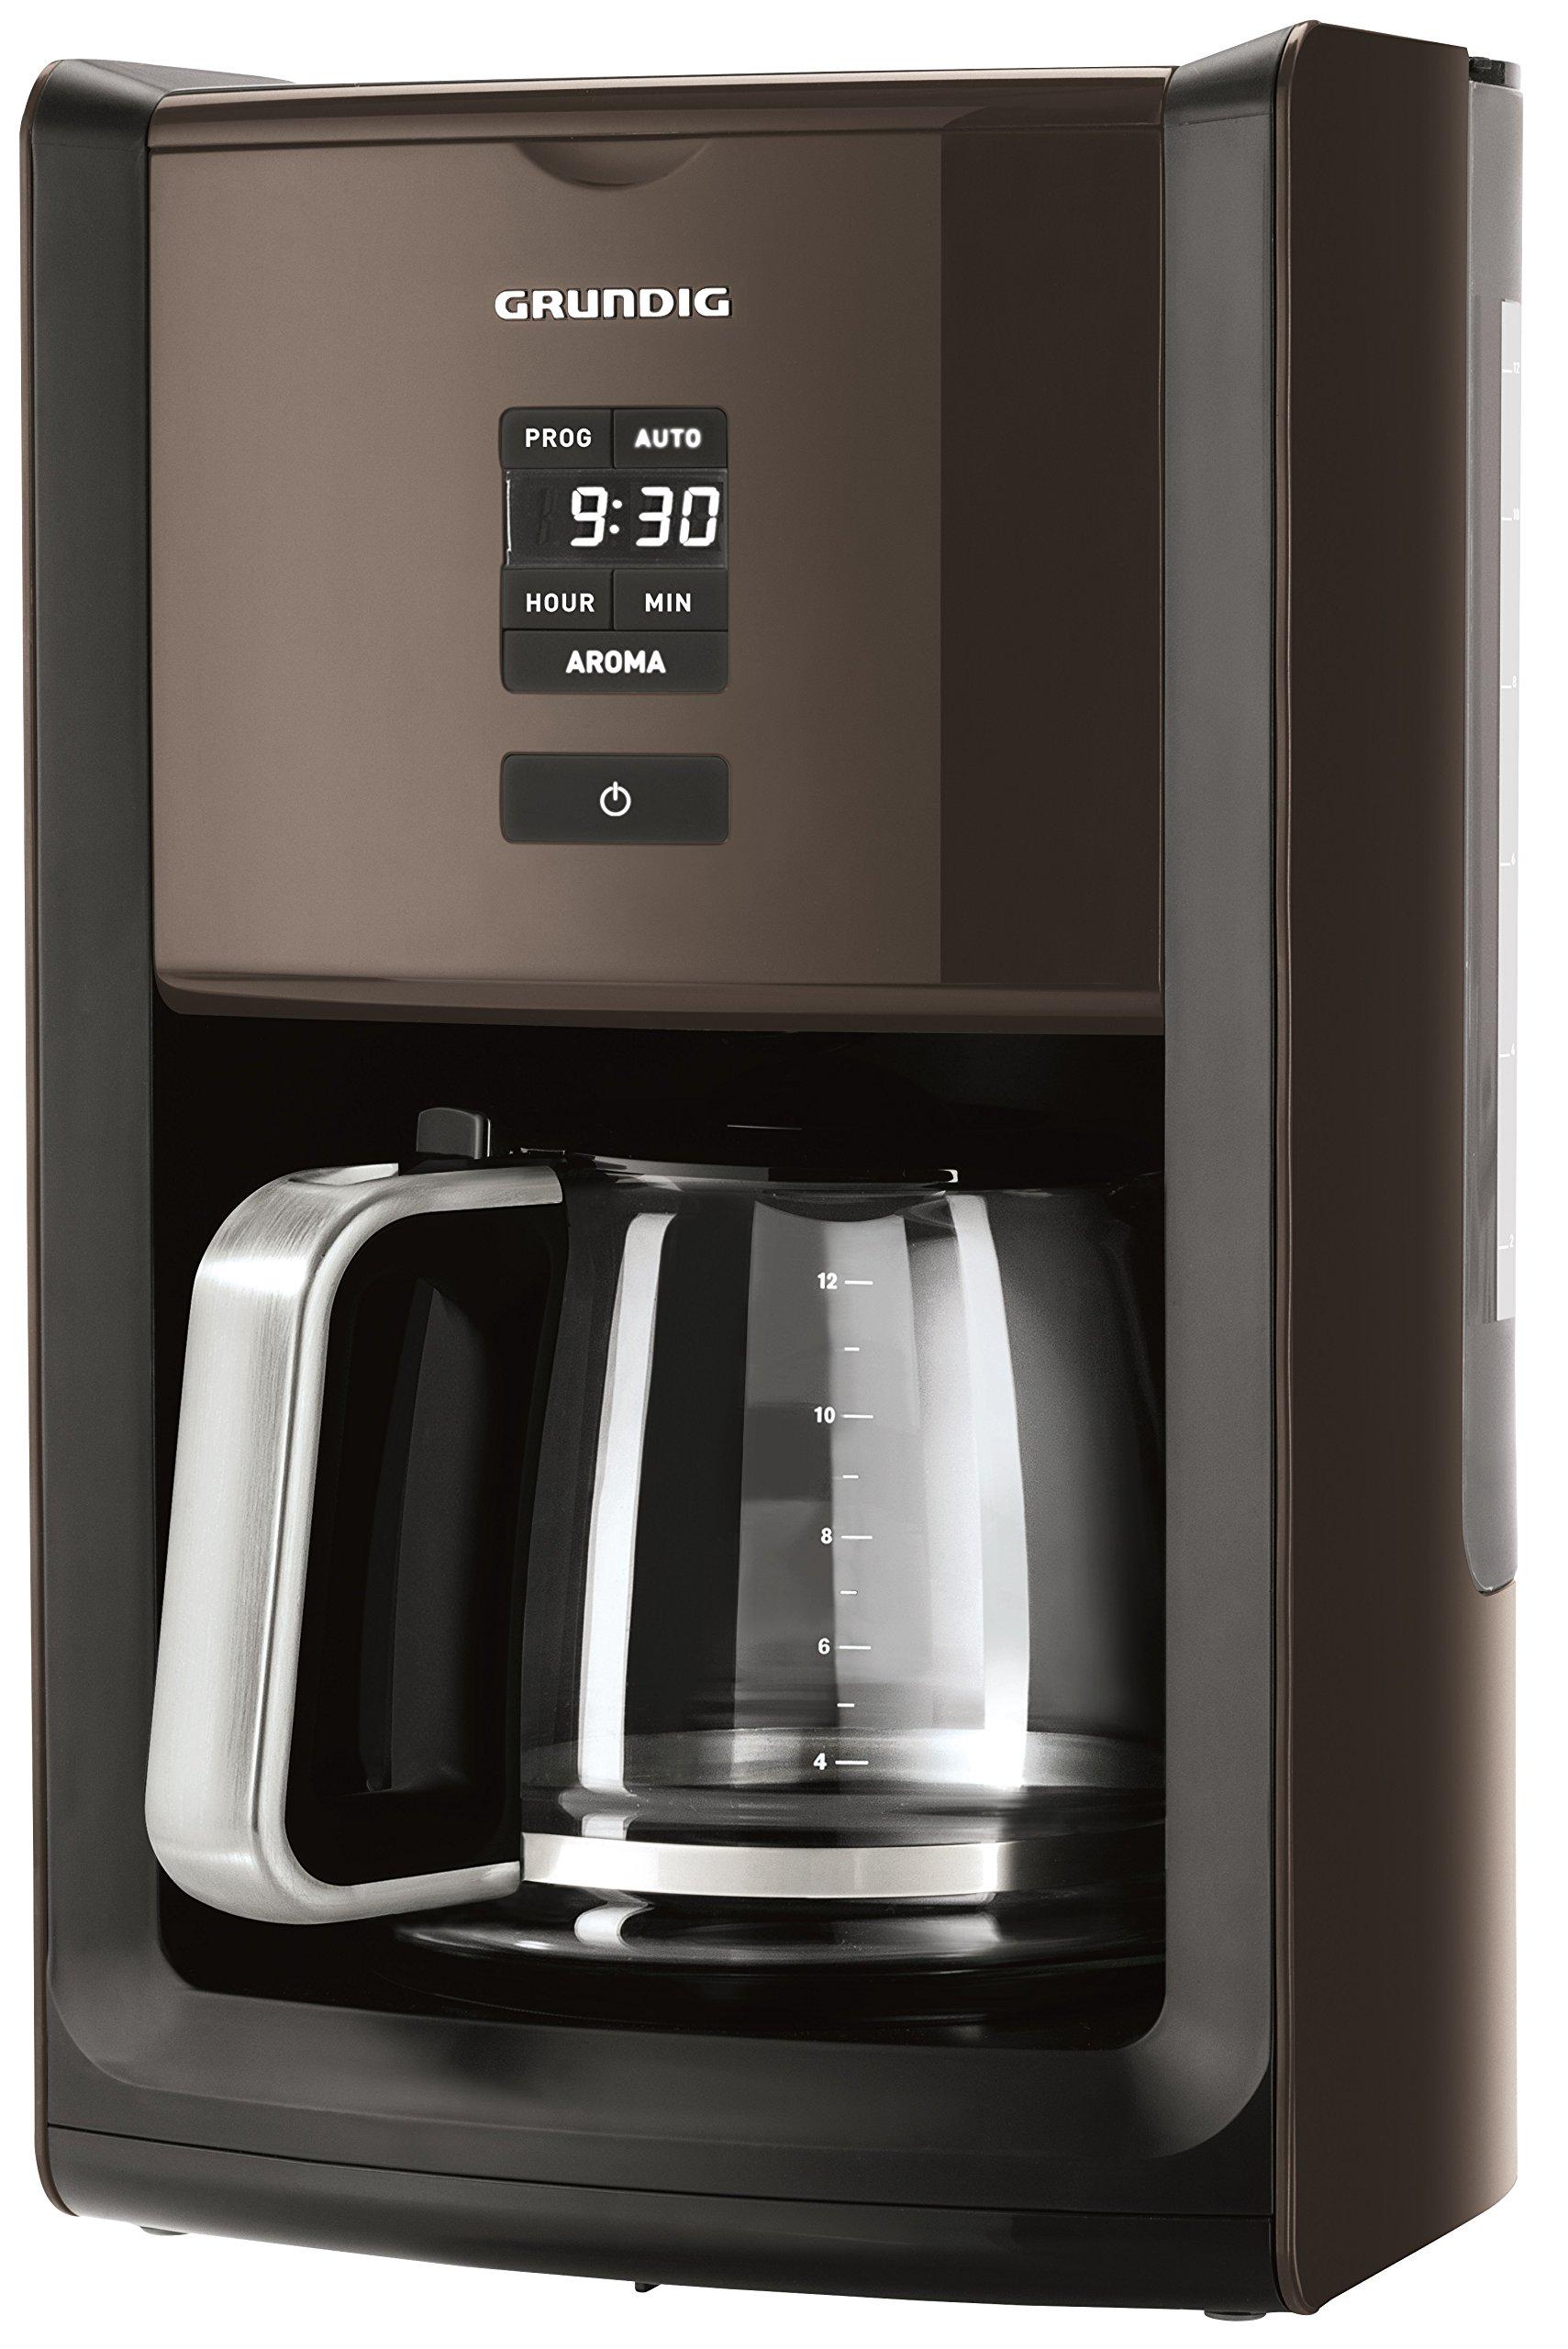 Grundig-KM-7280w-Kaffeemaschine-programmierbarGourmet-1000-Watt-18-l